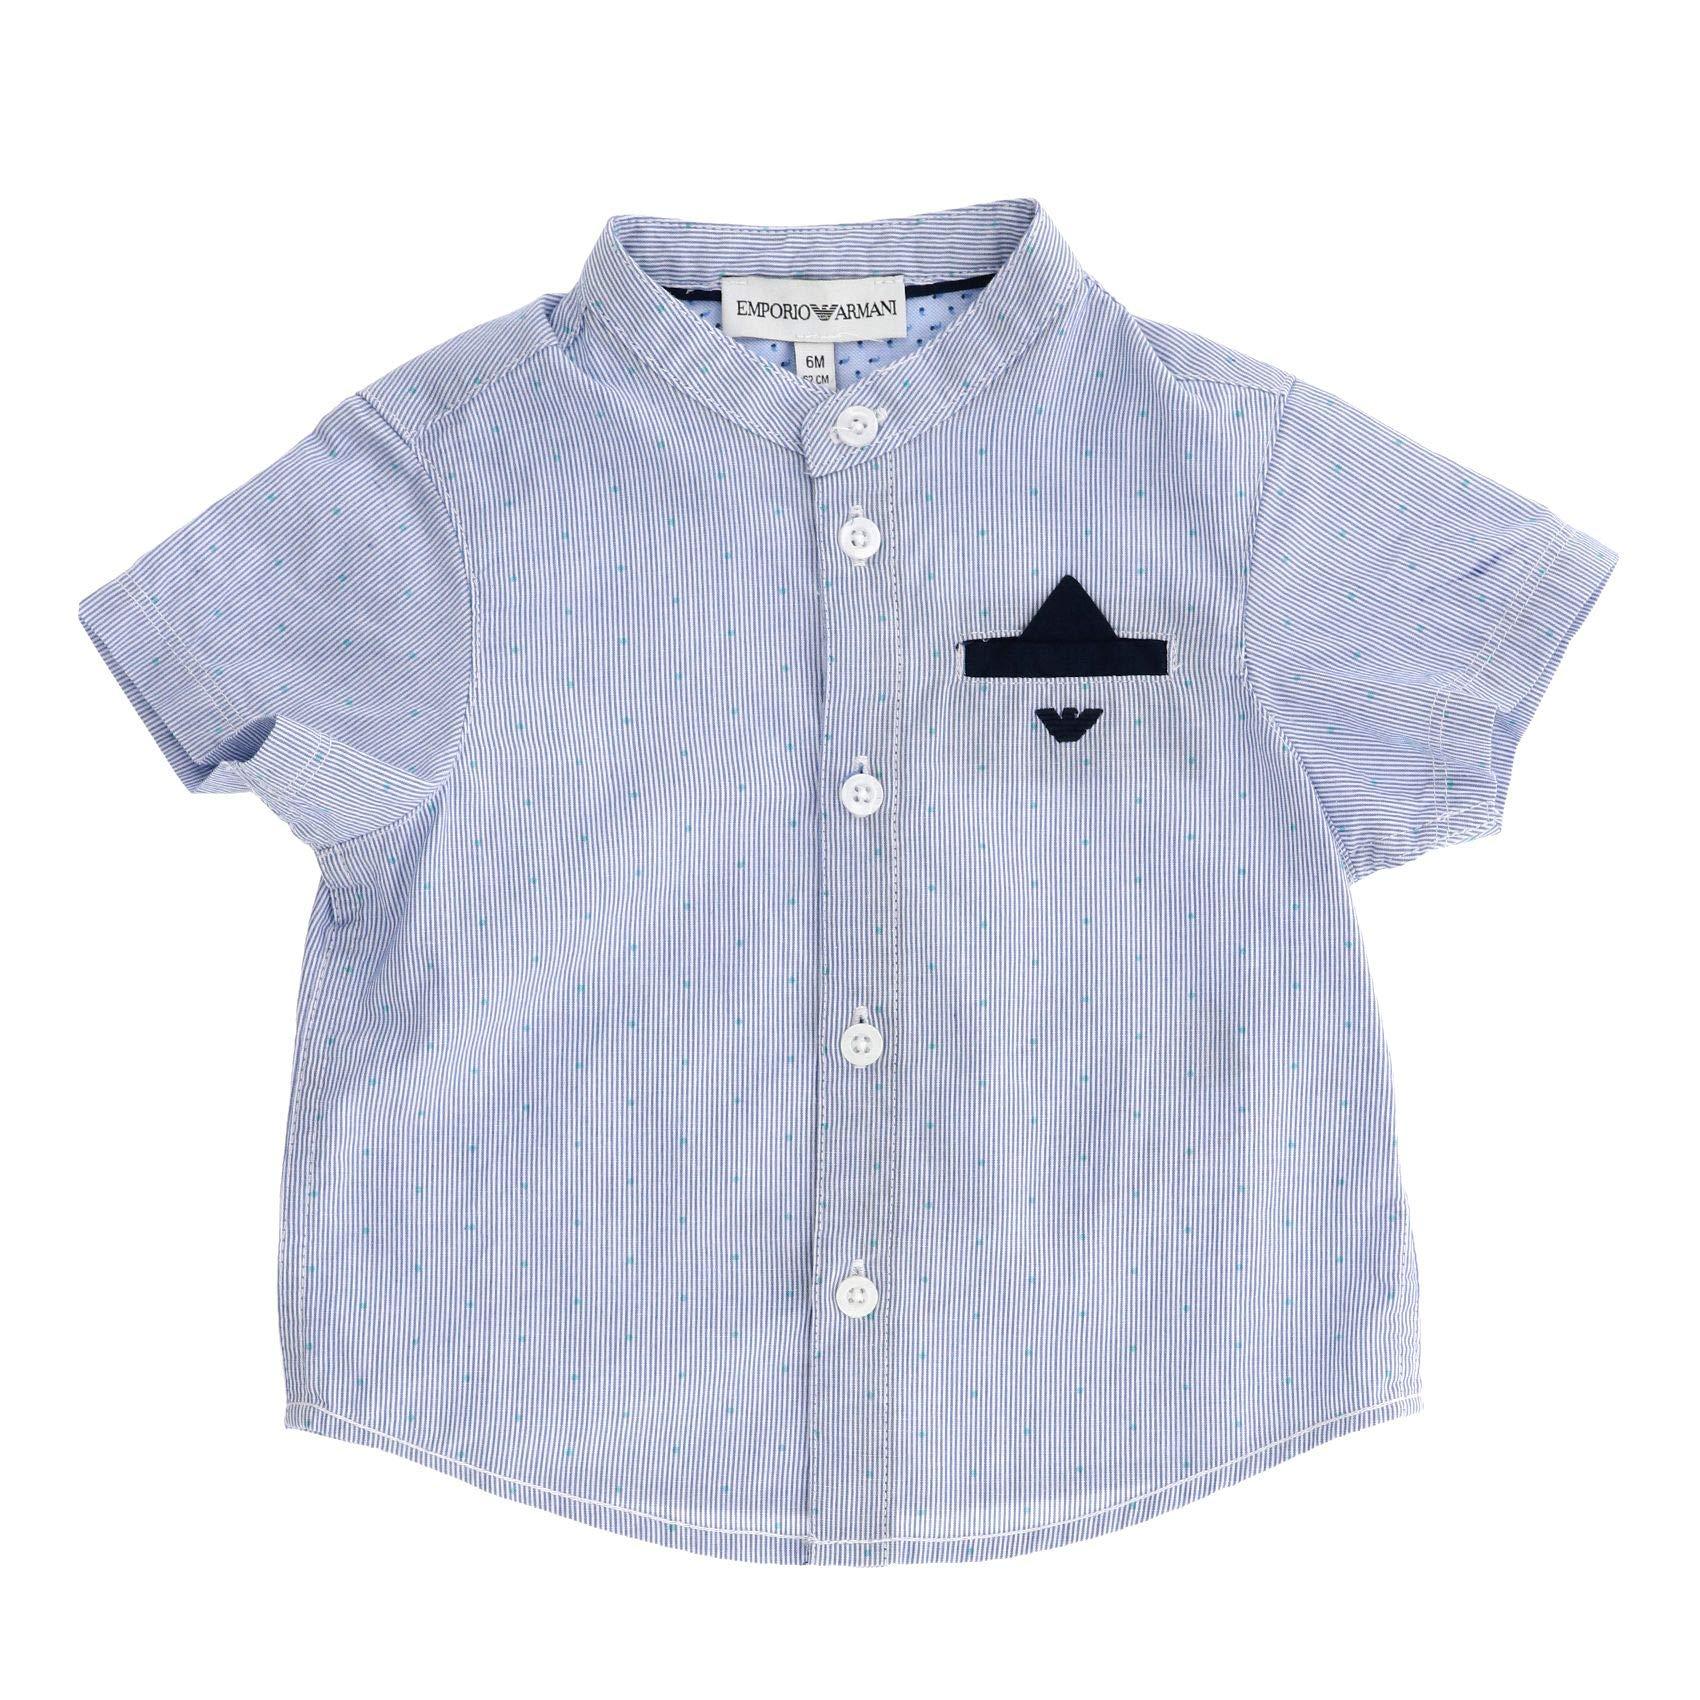 Emporio Armani Luxury Fashion Baby-Boys Shirt Summer Blue by Emporio Armani